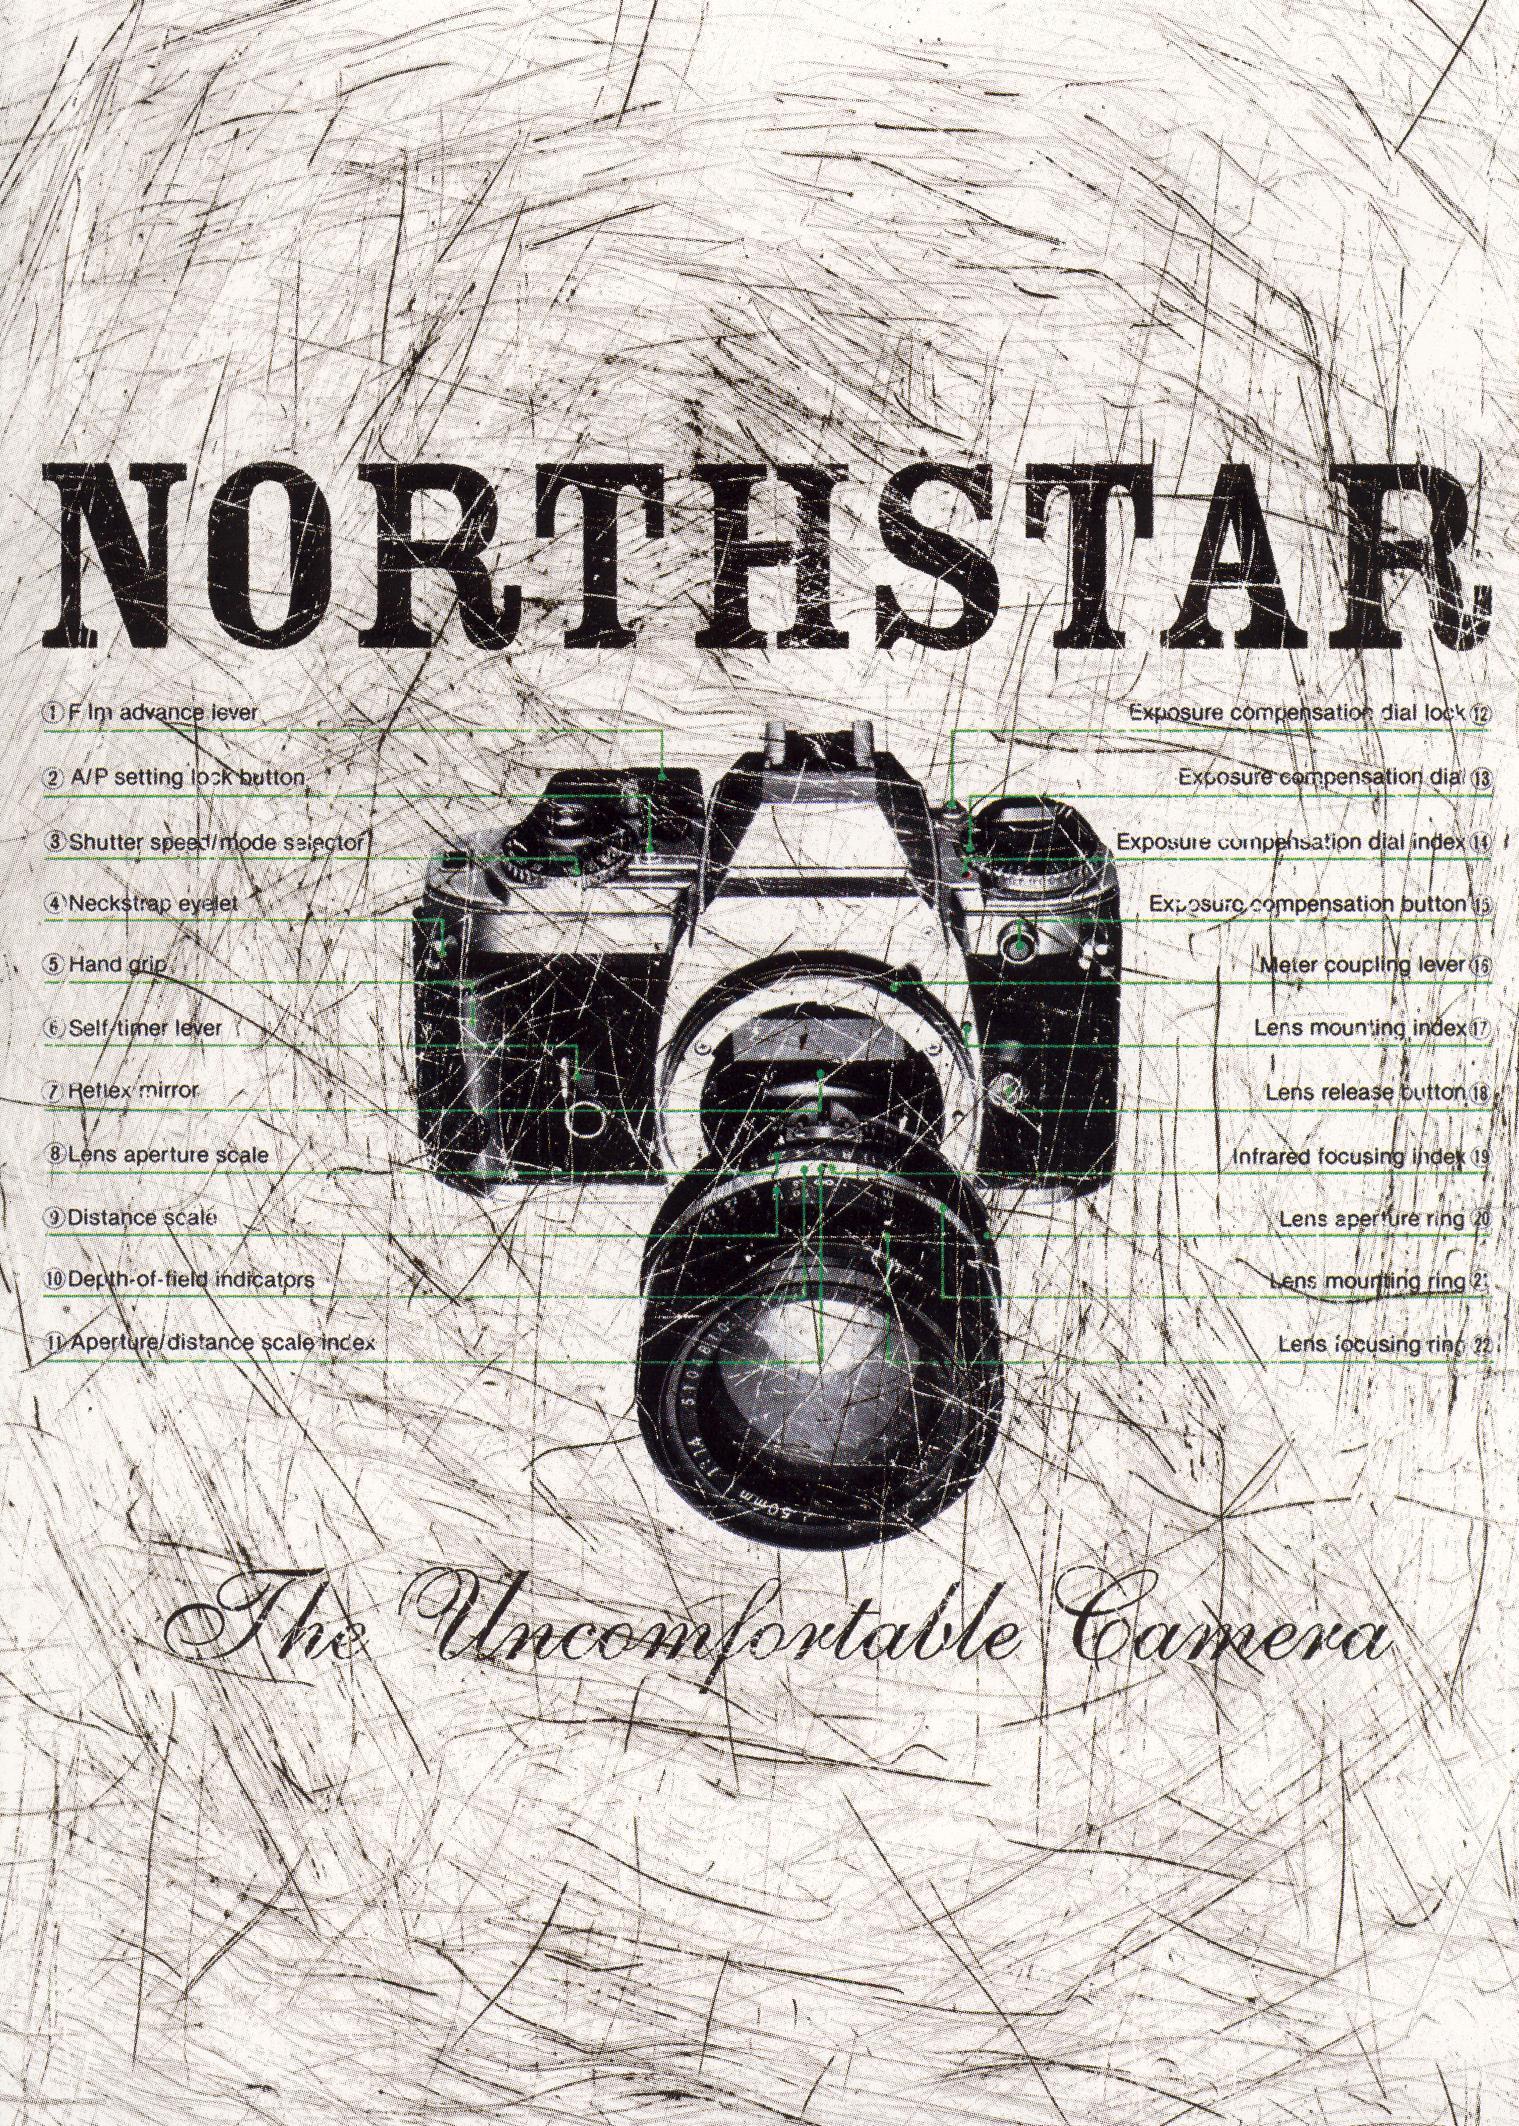 Northstar: The Uncomfortable Camera